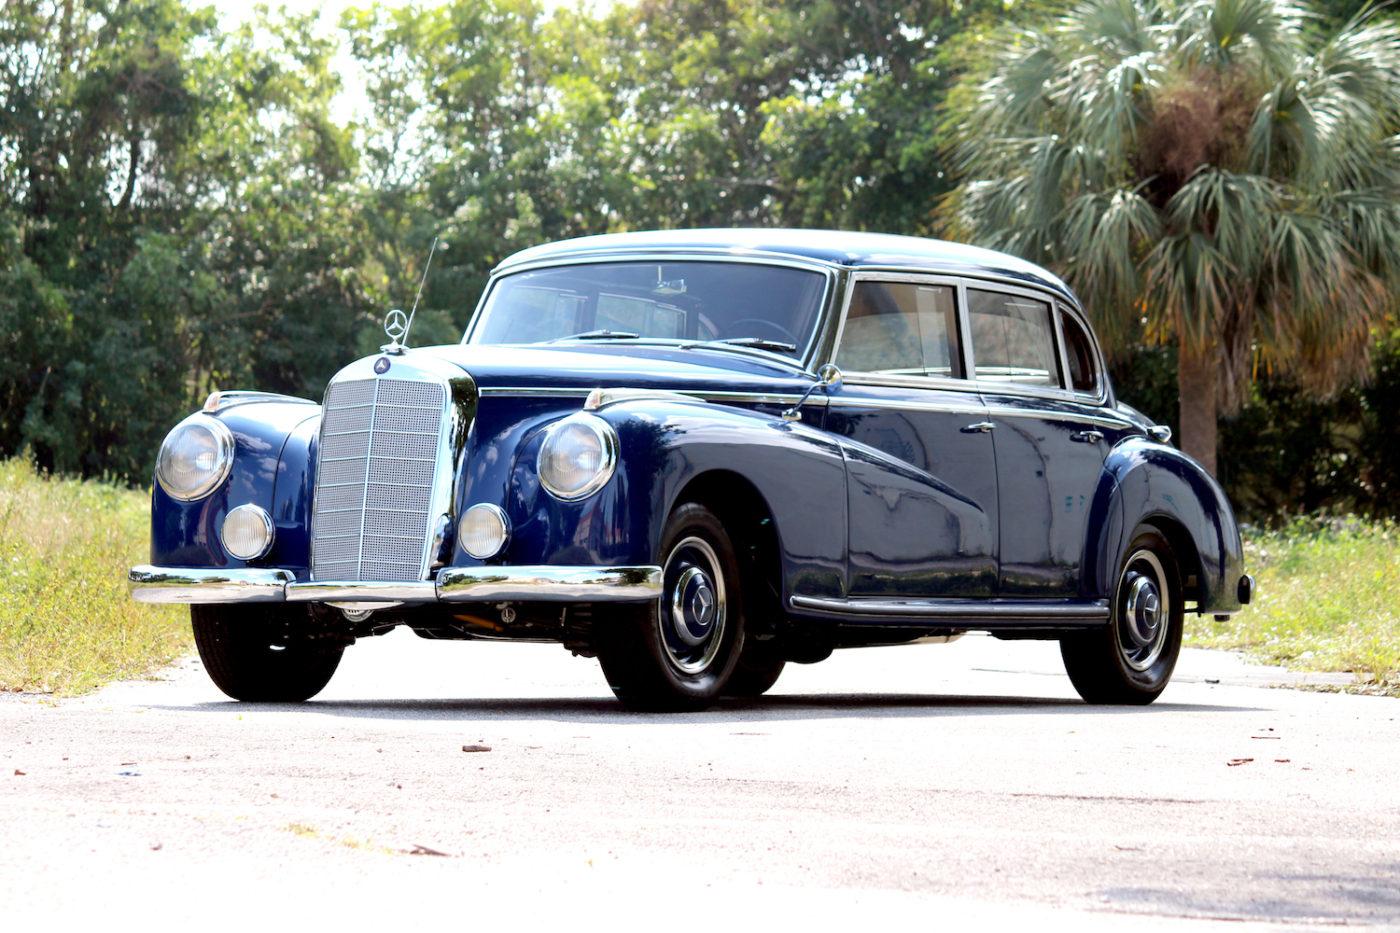 Palm Beach Classics: Classic Cars Sales | Restoration | Parts & More